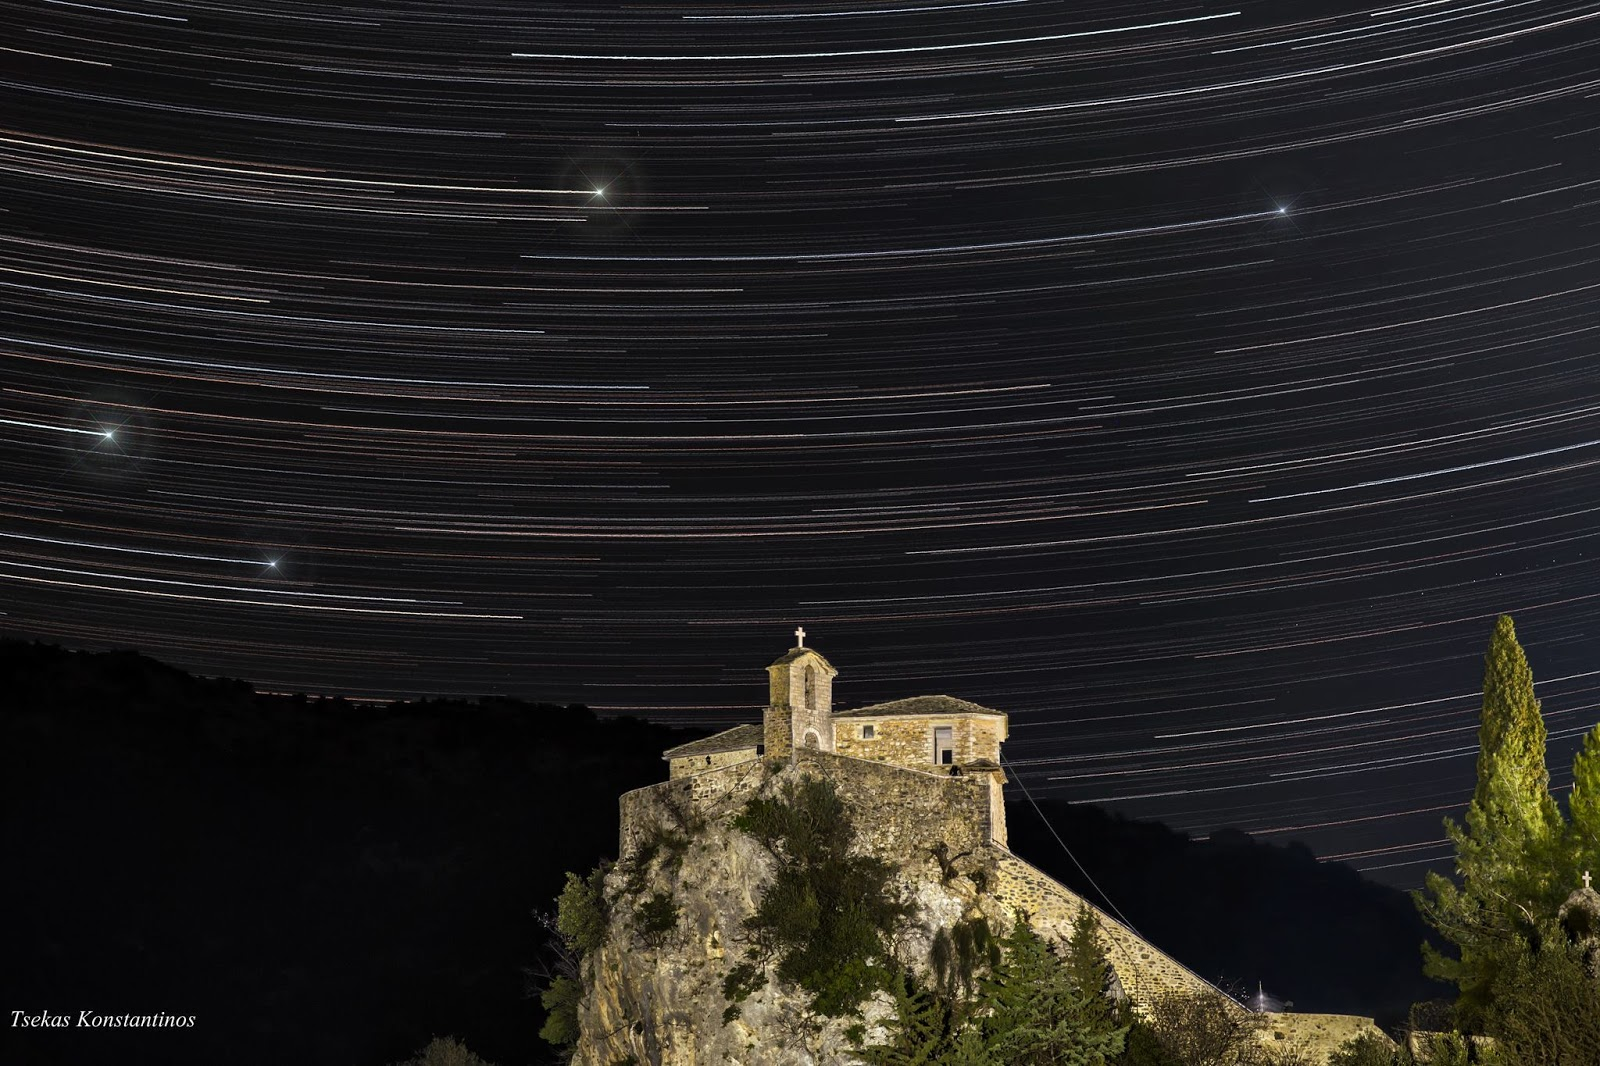 Photo Credit: Κωνσταντίνος Τσέκας